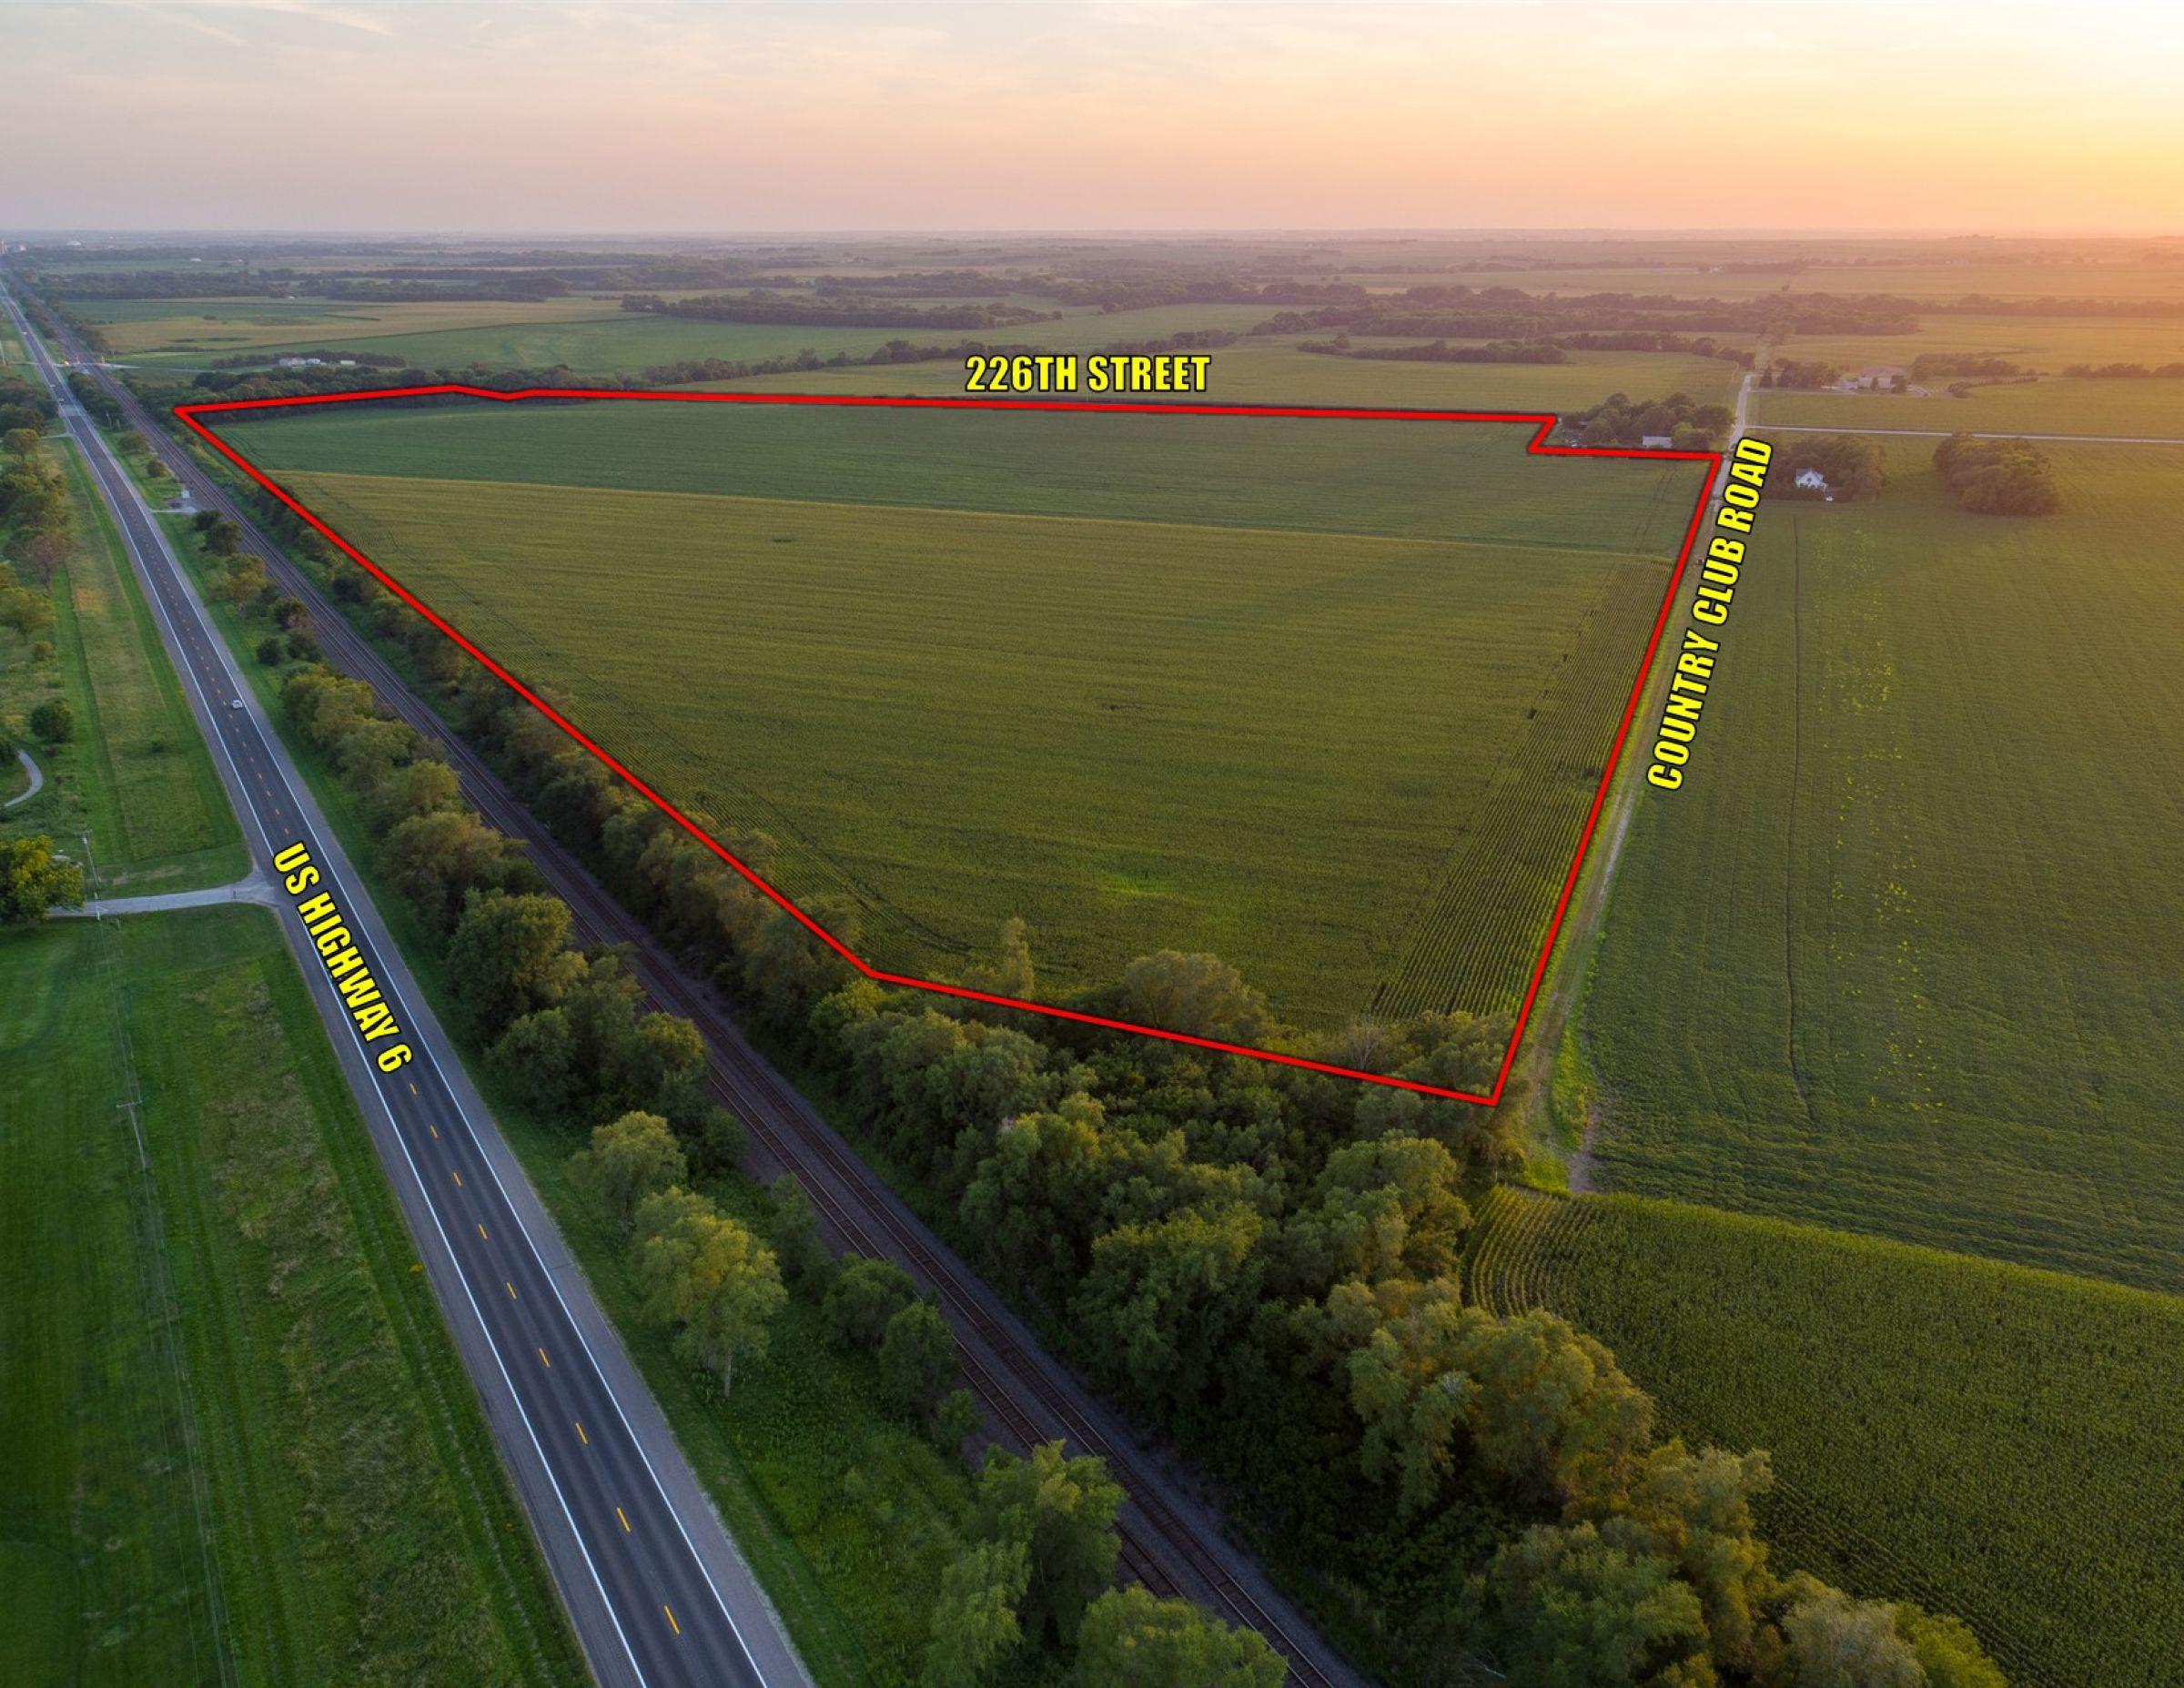 auctions-land-cass-county-nebraska-107-acres-listing-number-15713-0-2021-09-02-173143.jpg